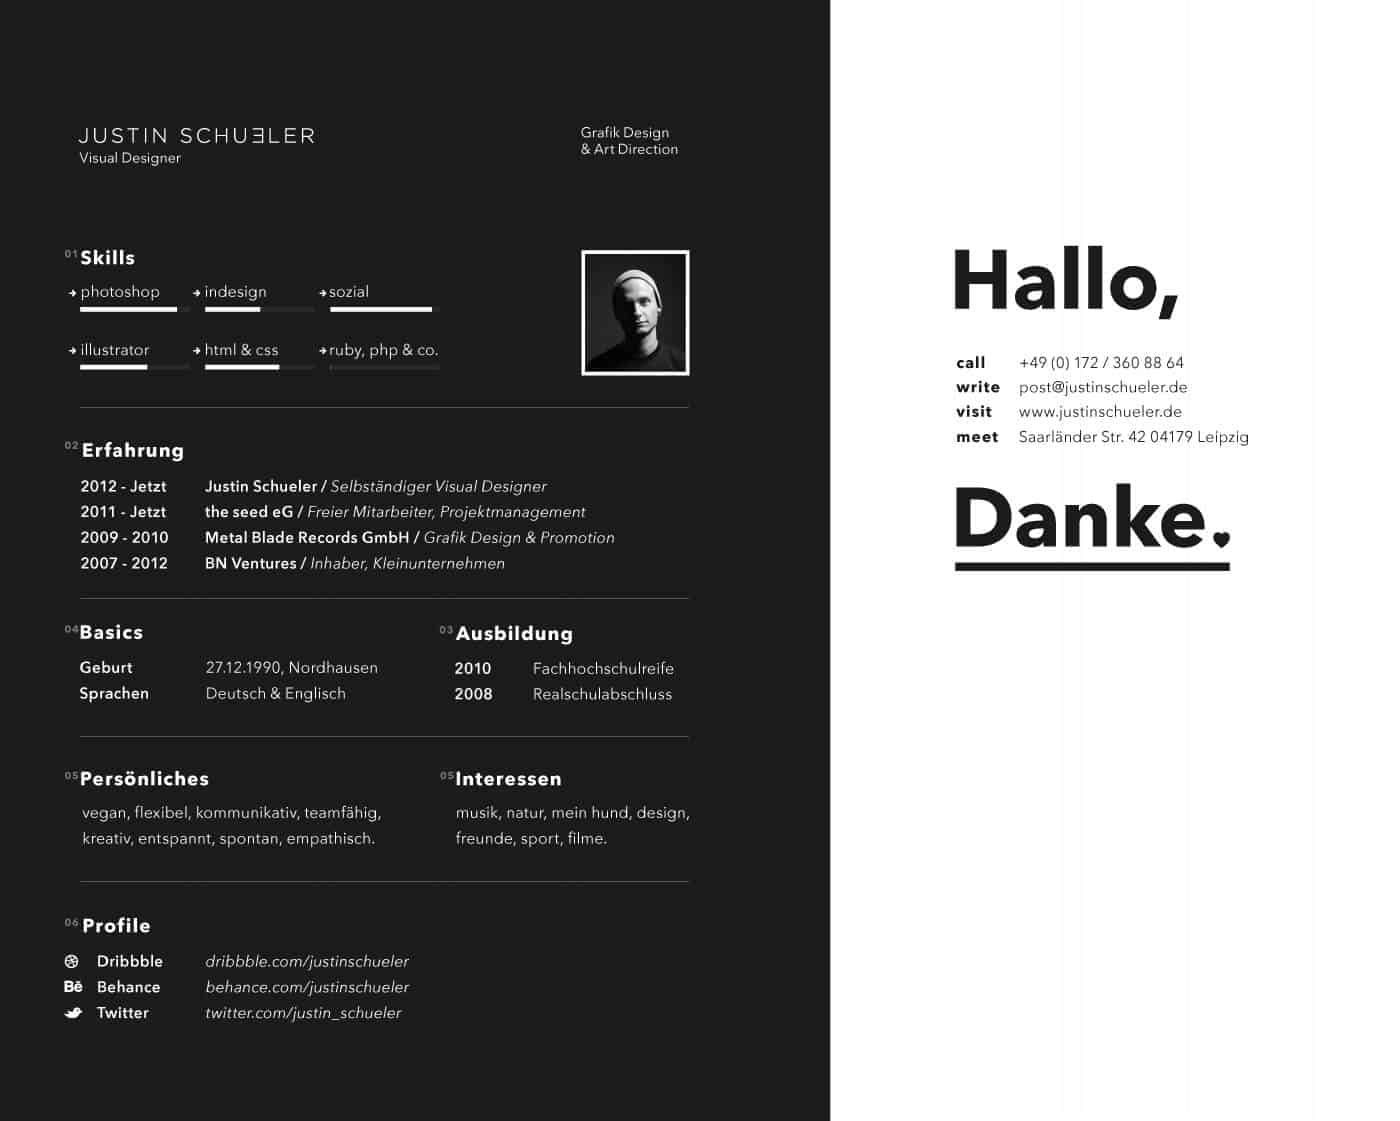 visual designer resume, visually appealing cv examples